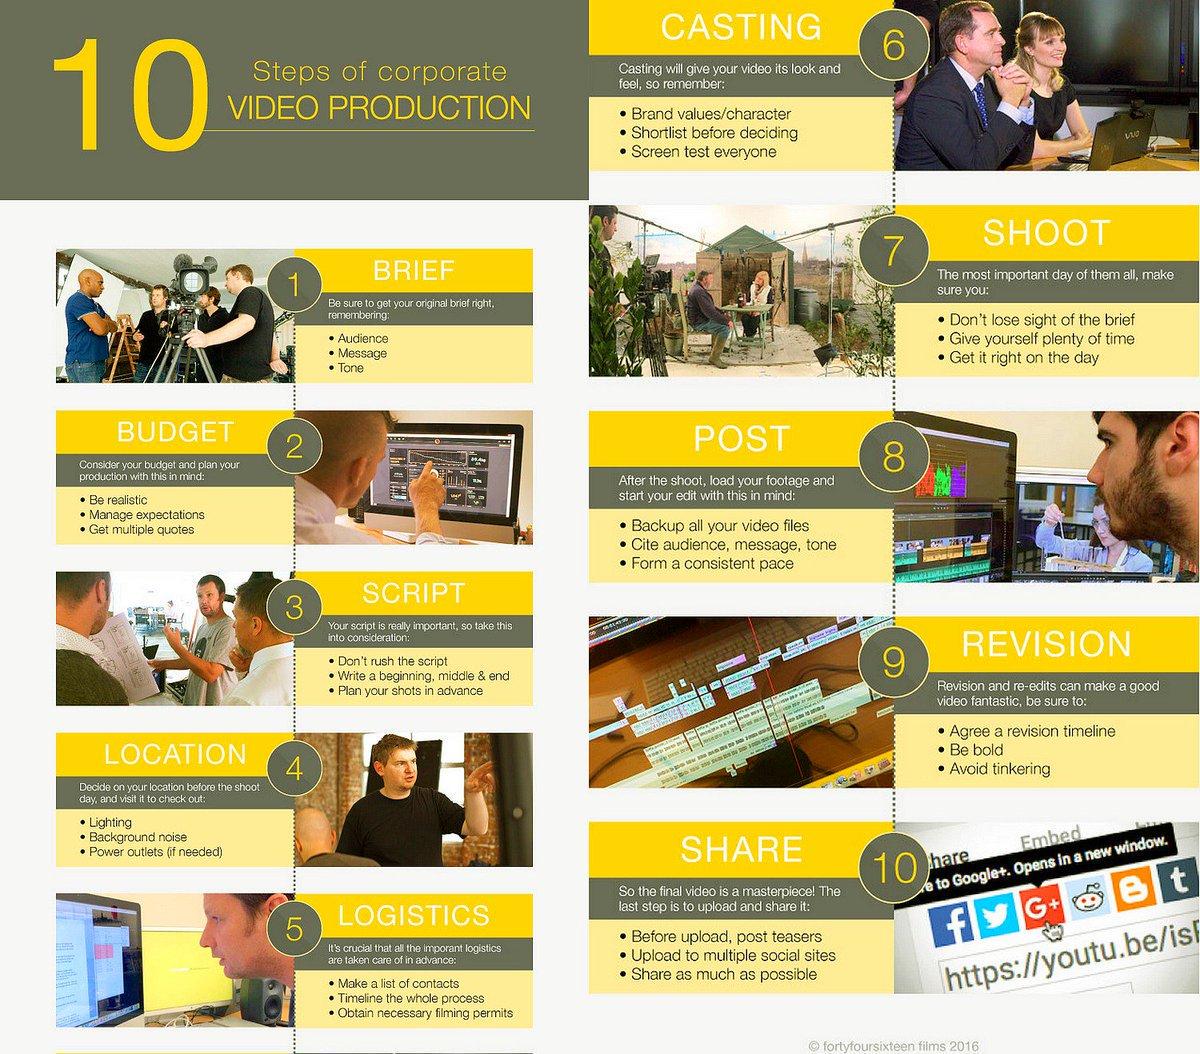 #VideoMarketing: The 10 Steps of Corporate Video Production  #ContentMarketing #GrowthHacking #DigitalMarketing<br>http://pic.twitter.com/fGRRtDojLW